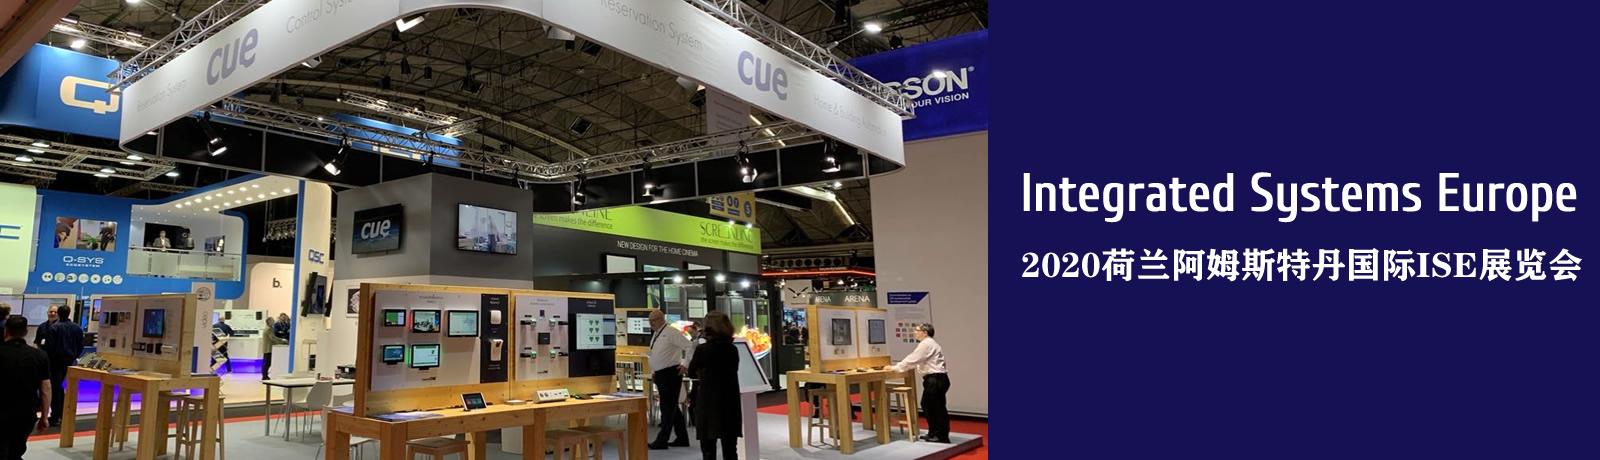 CUE在2020荷兰阿姆斯特丹国际ISE展览会现场展台